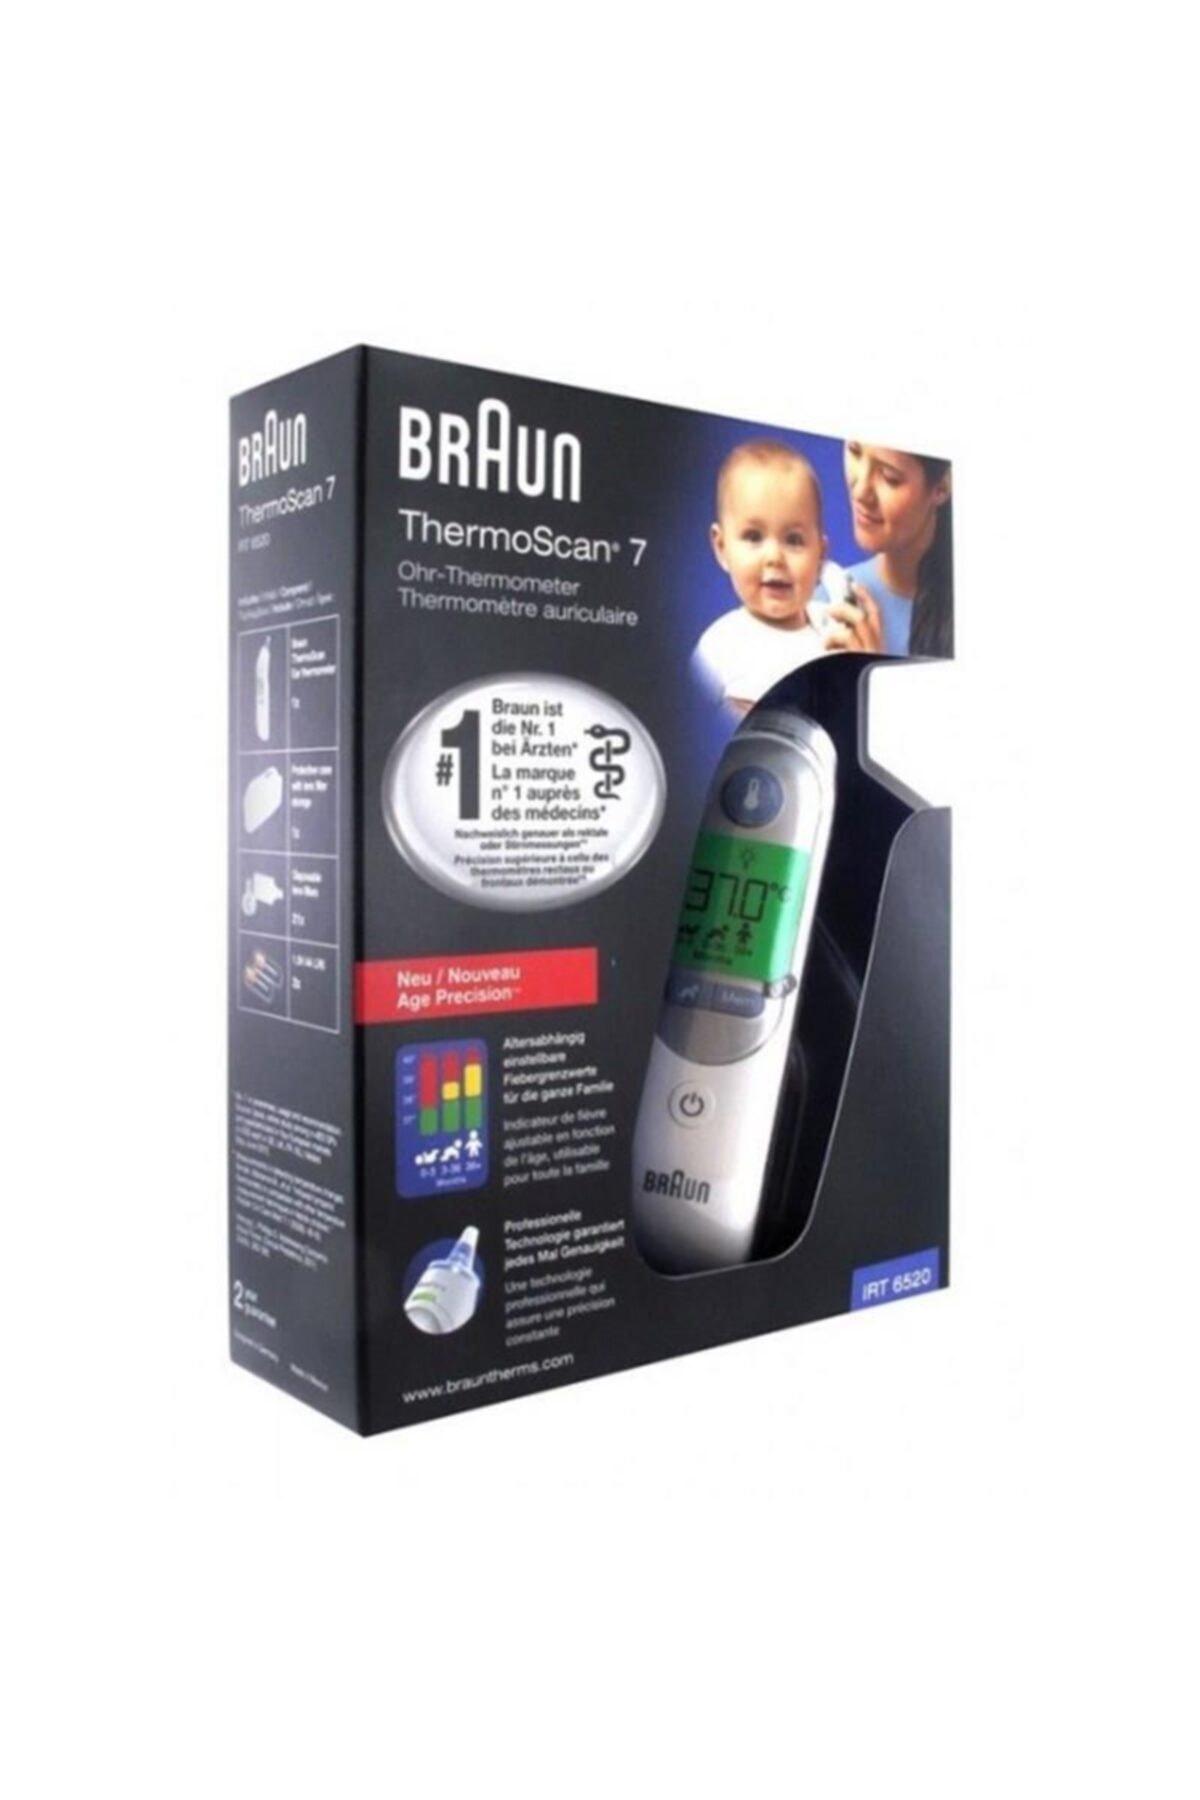 Braun Irt6520 Thermoscan Kulaktan Ateş Ölçer 2